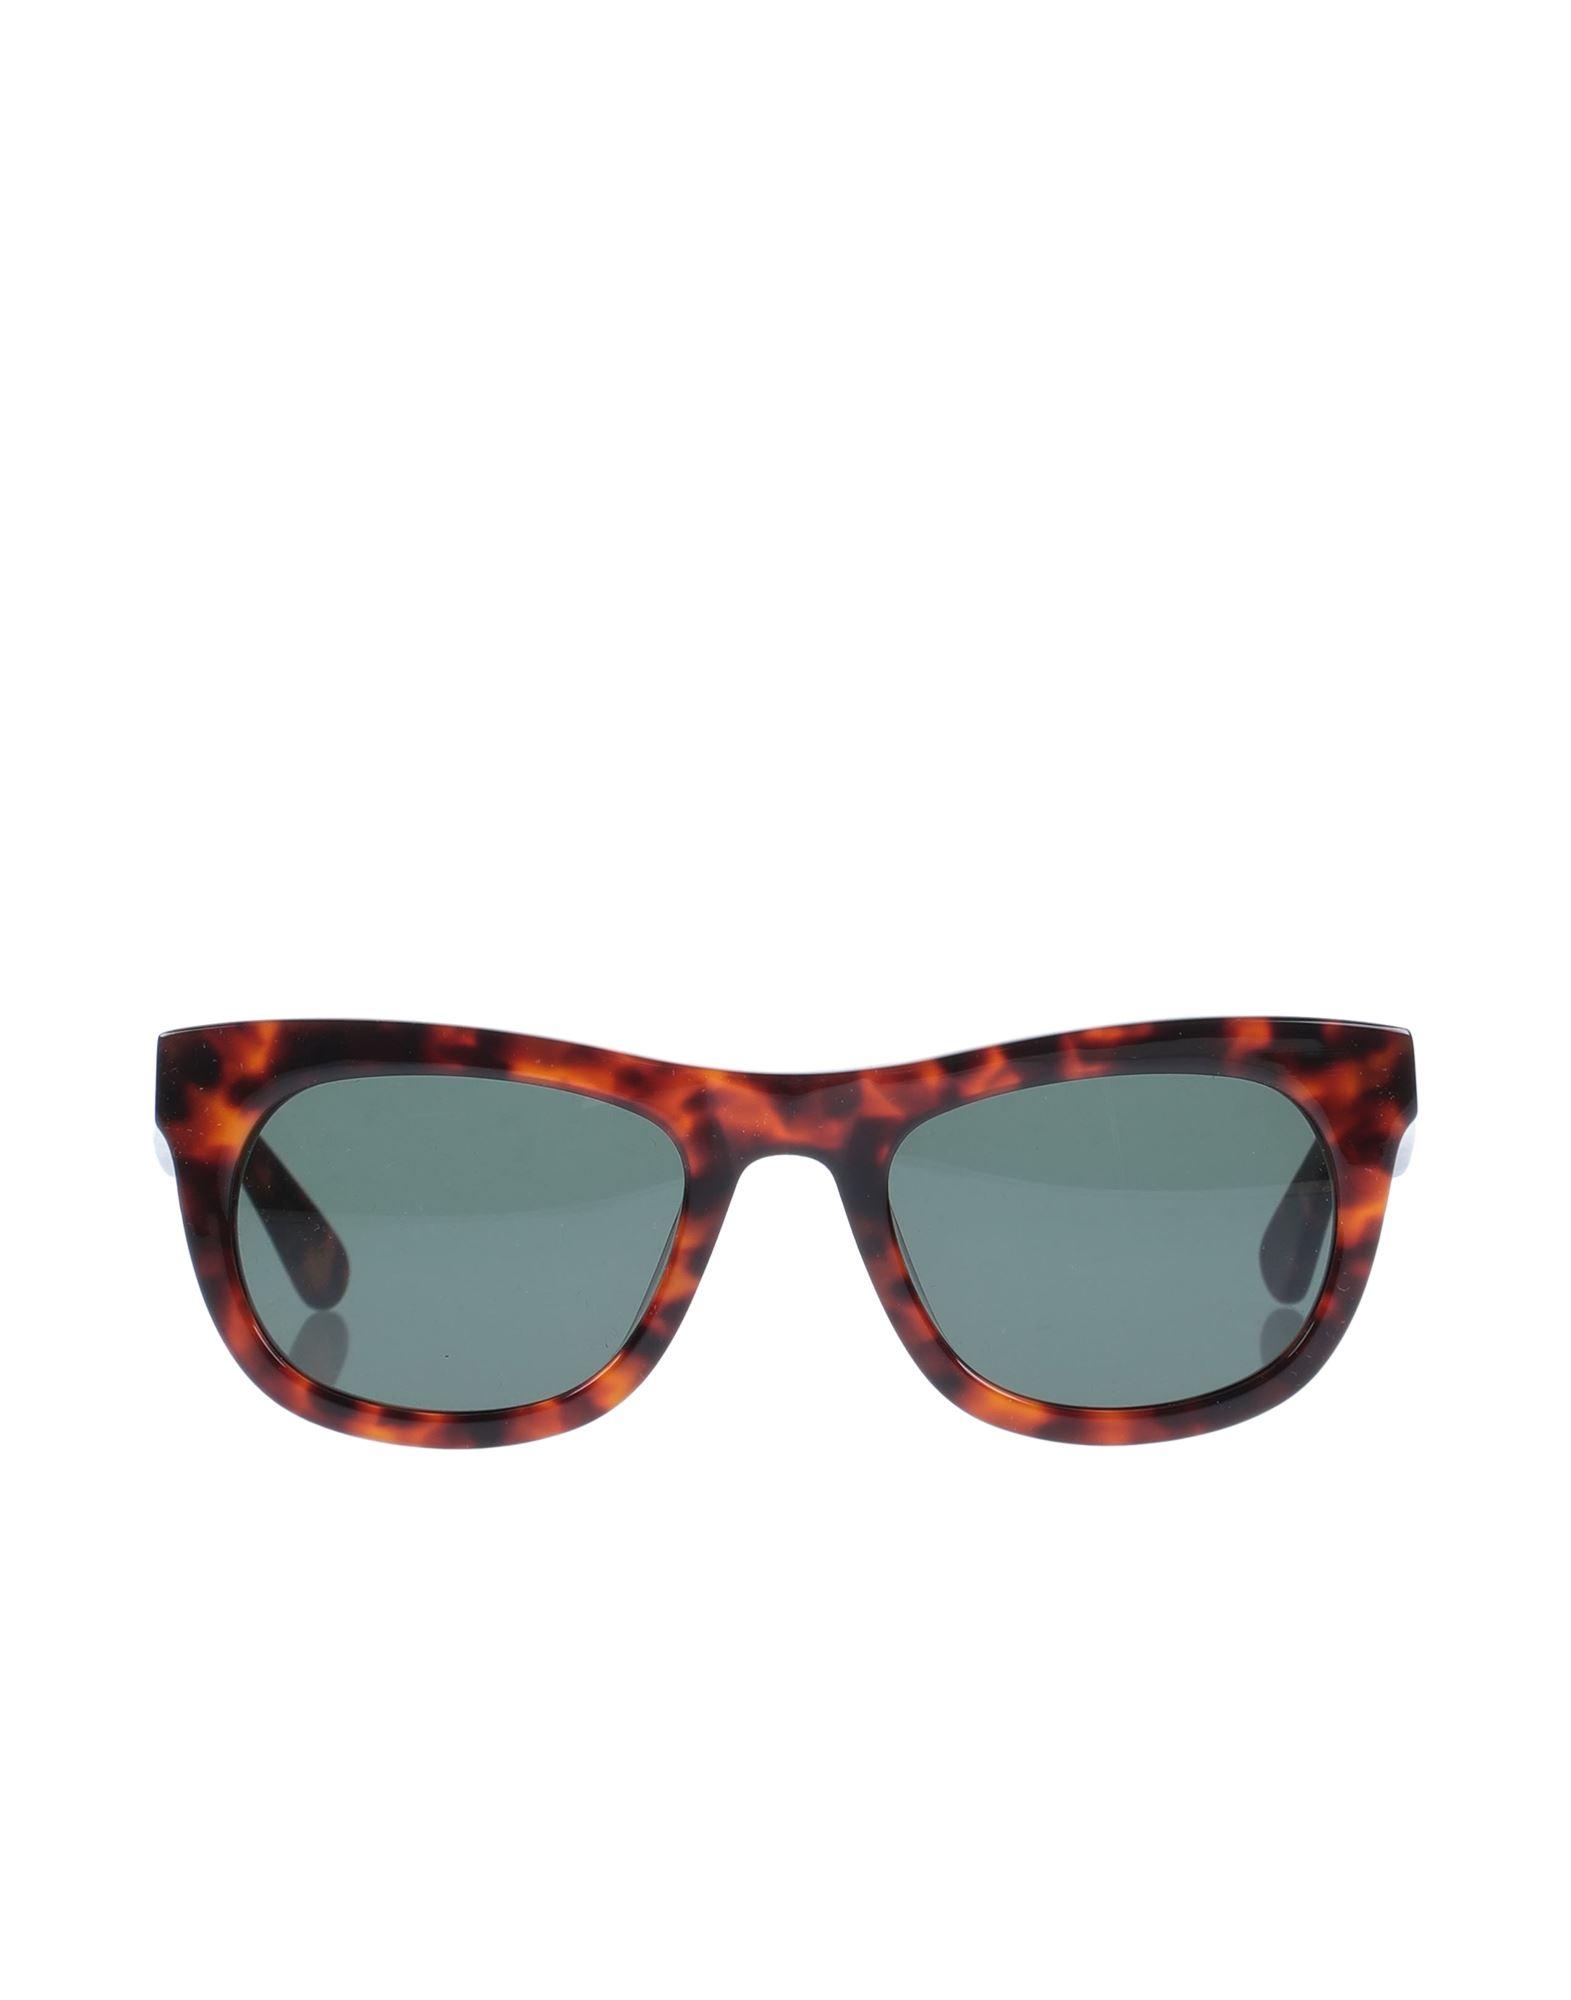 HAN KJØBENHAVN Sunglasses - Item 46745064